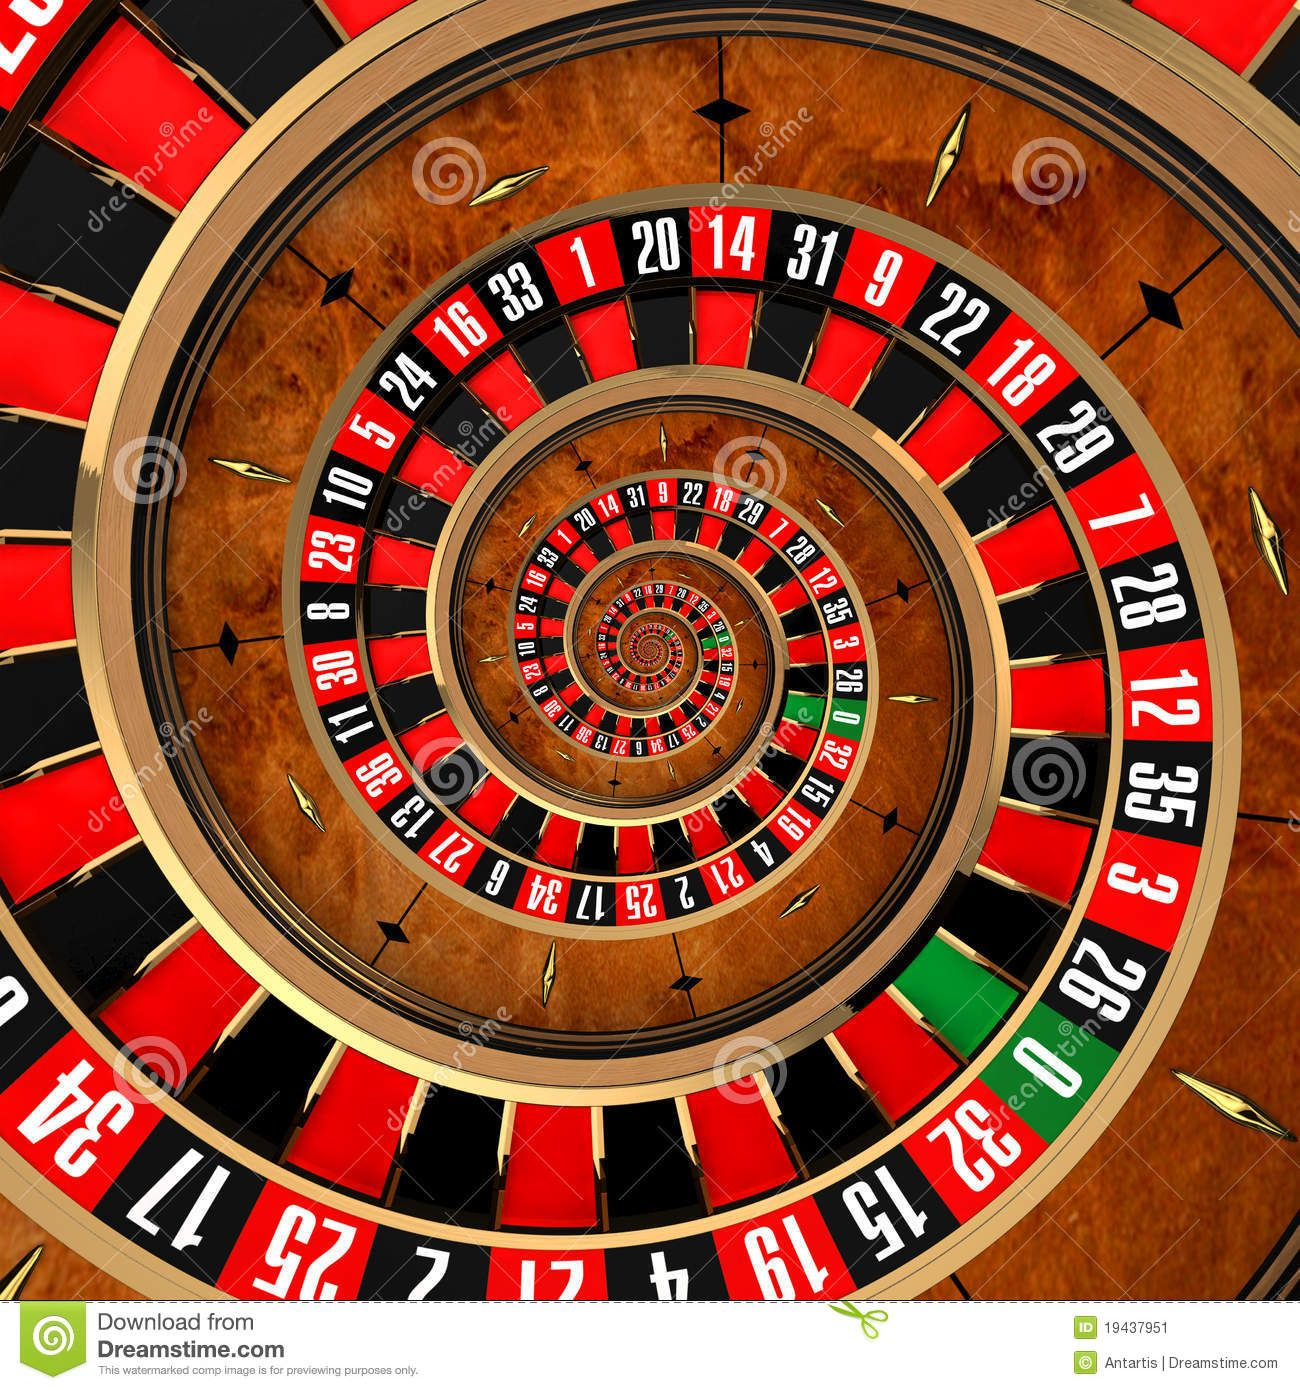 E betting roulette - 89551